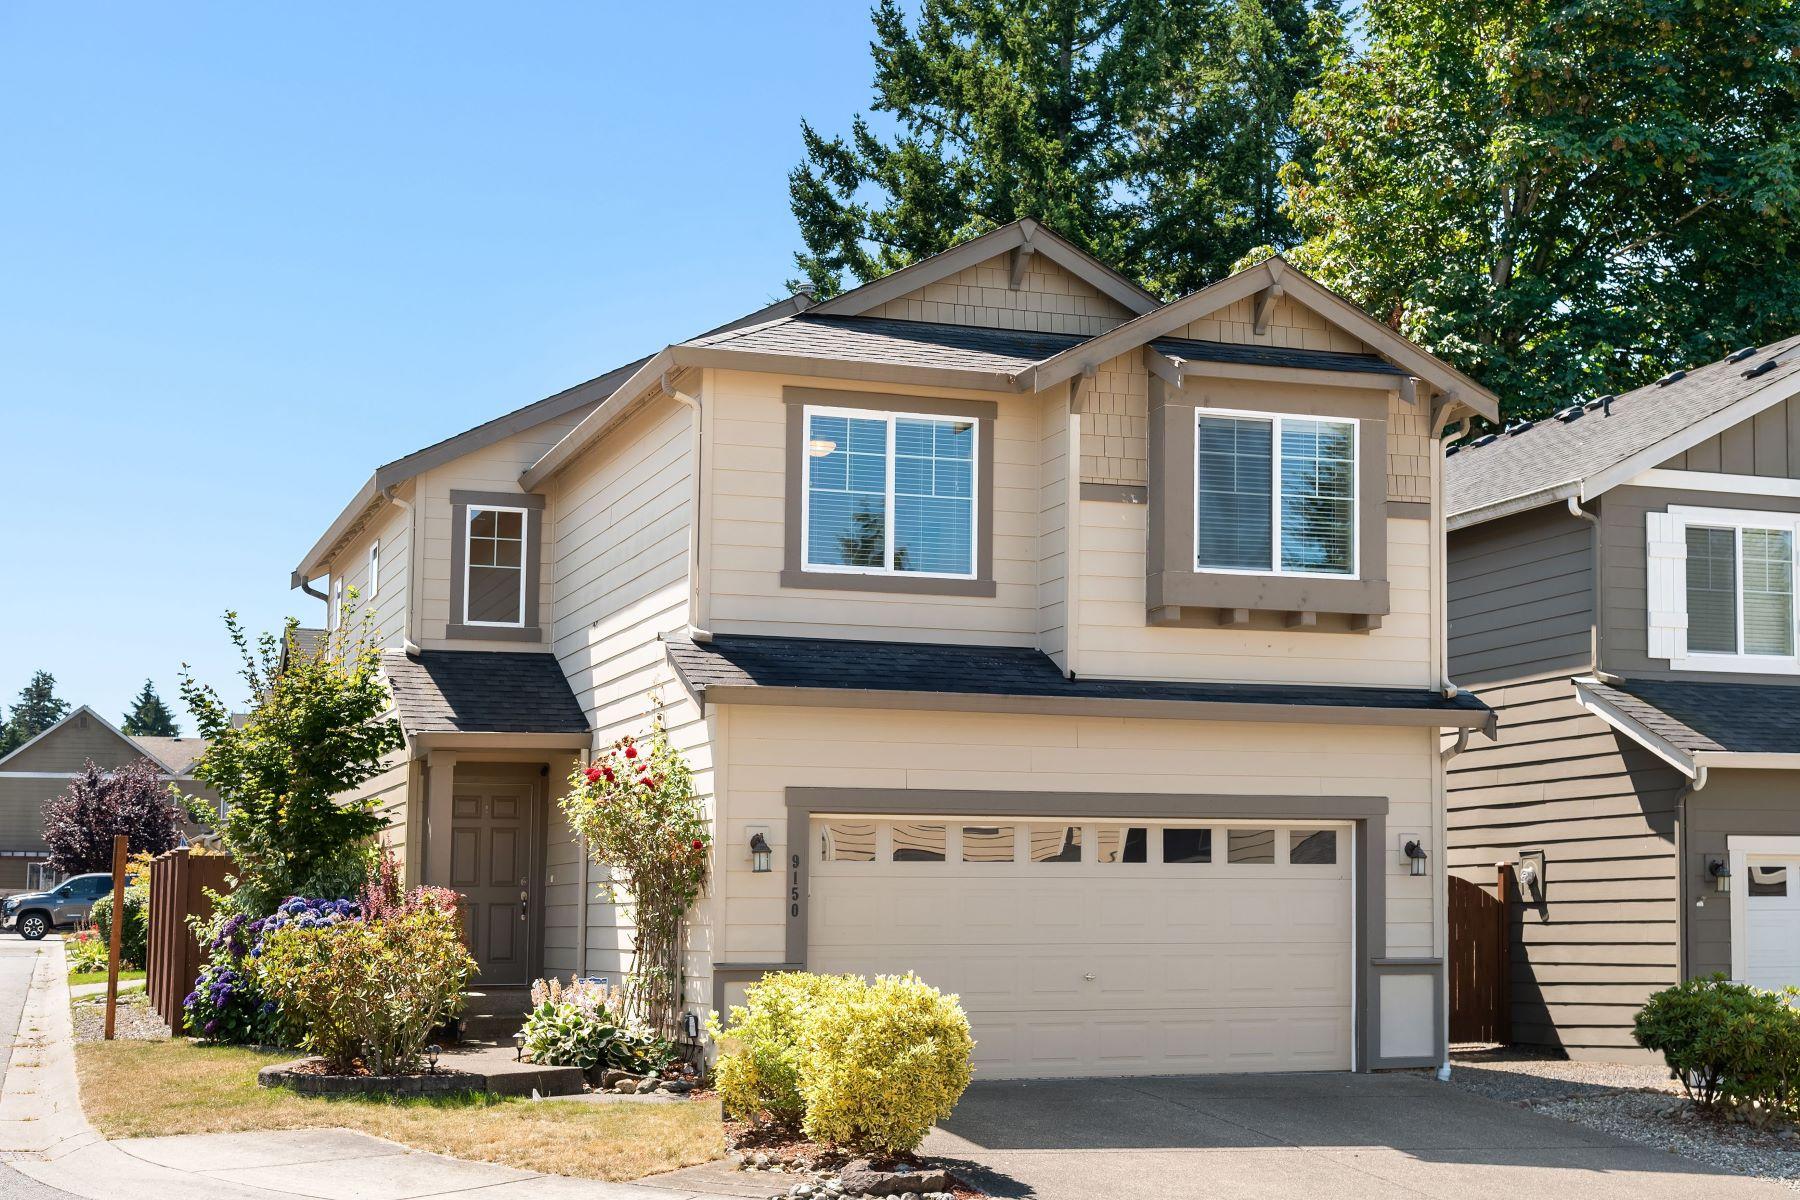 Single Family Homes for Sale at 9150 1st St SE, Lake Stevens, WA 98258 9150 1st St SE Lake Stevens, Washington 98258 United States